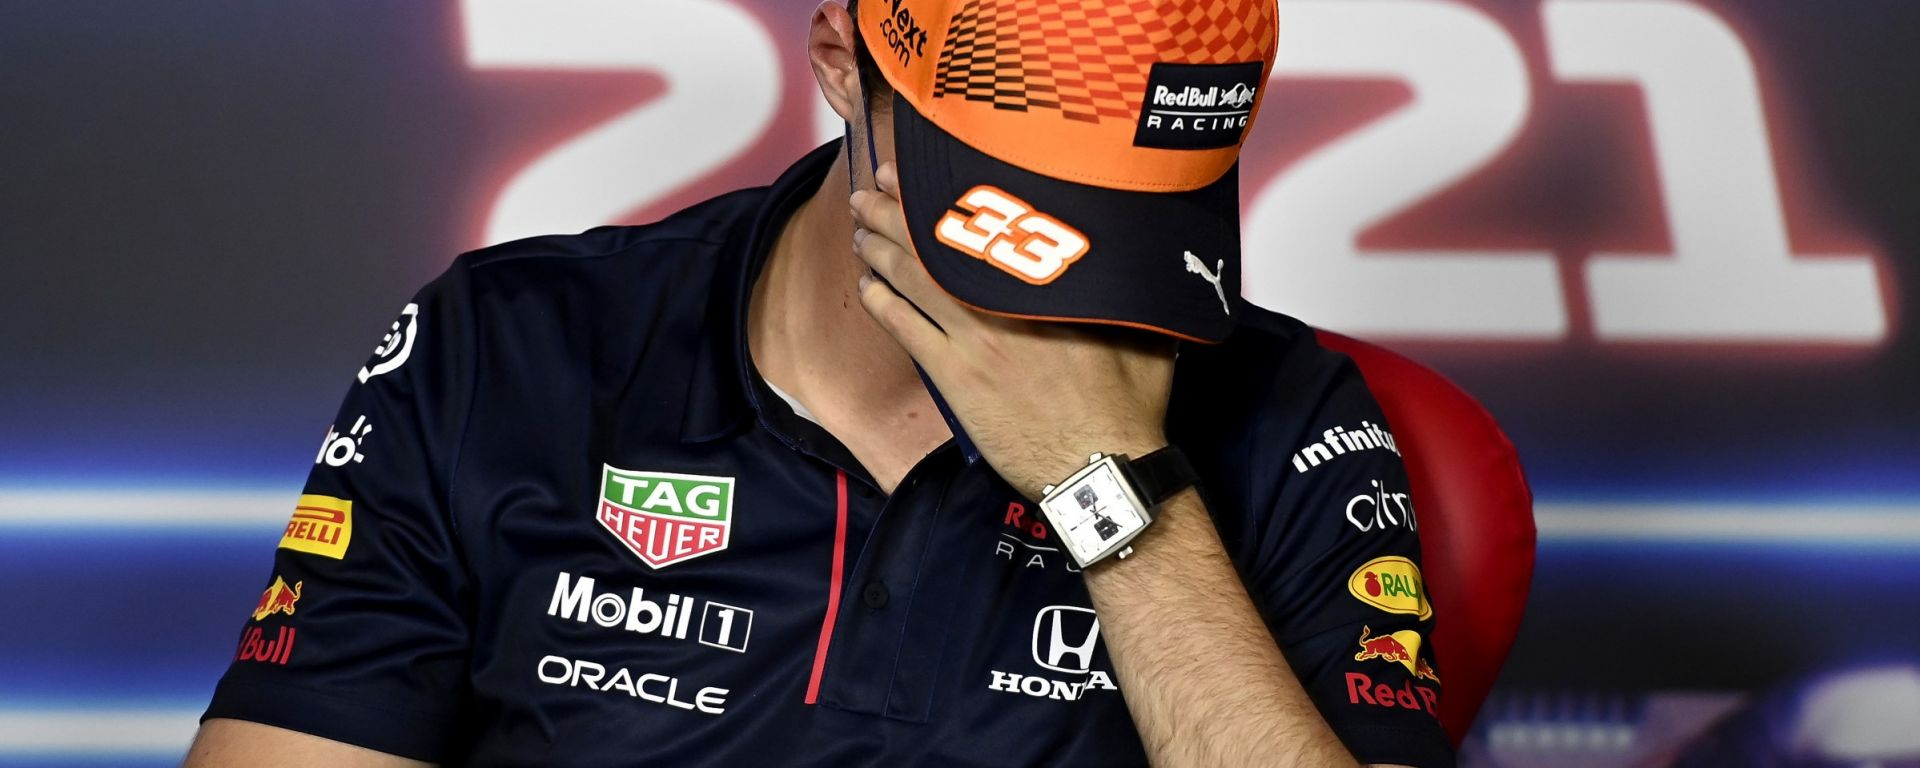 F1, GP Stiria 2021: Max Verstappen in conferenza stampa